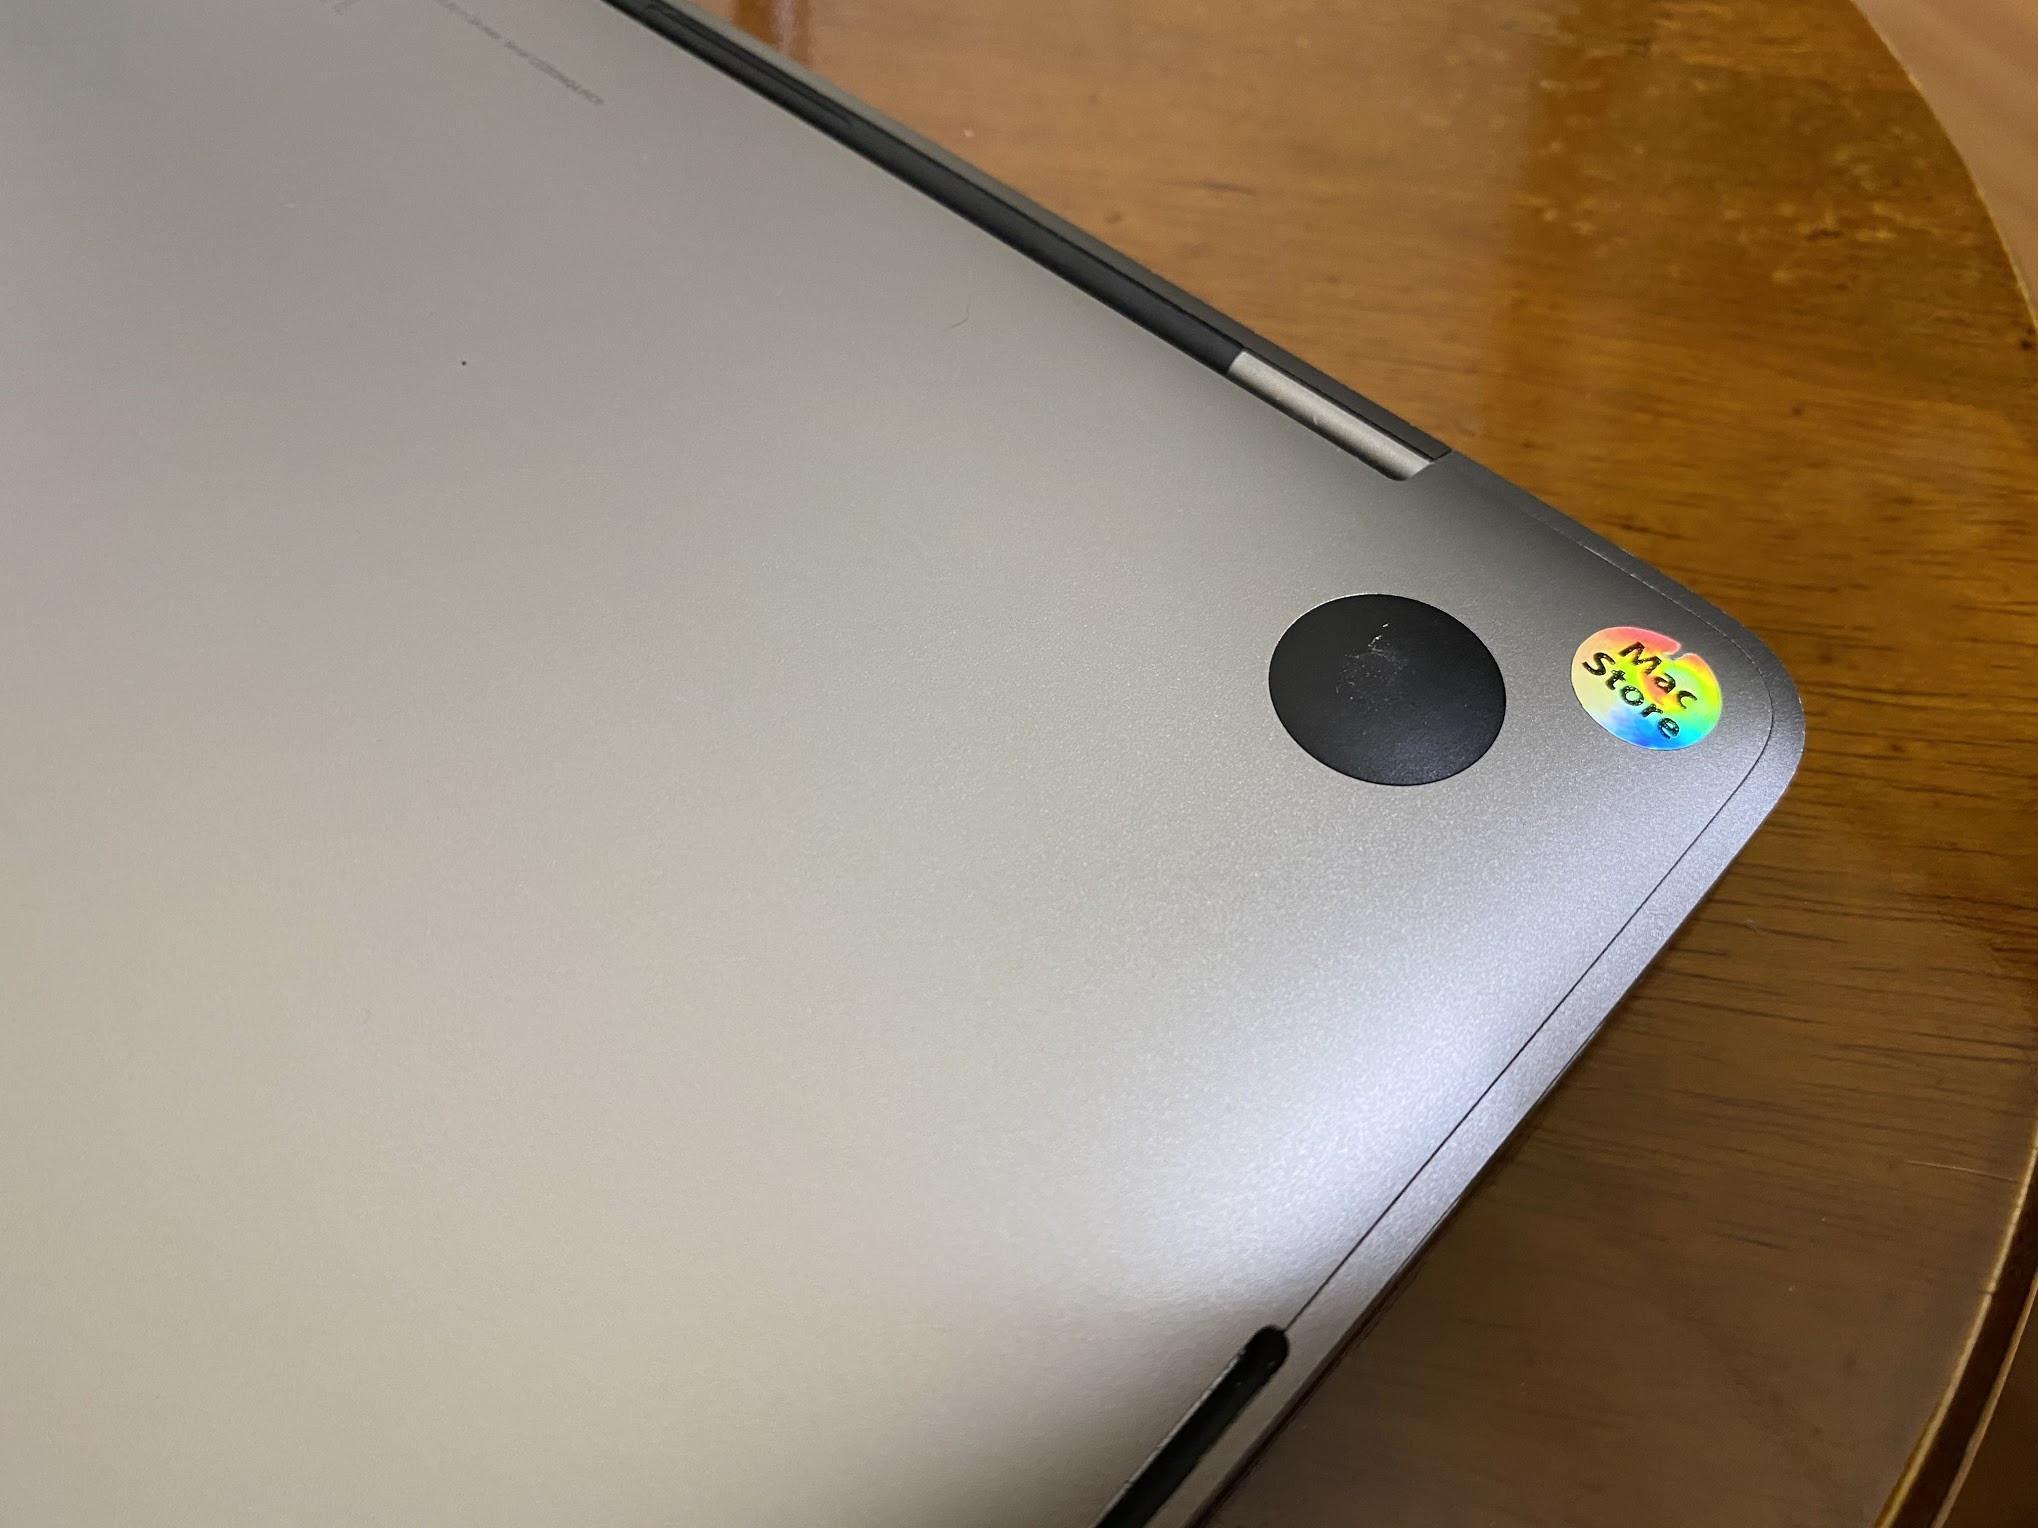 Macbook Pro 2018 13inch, Core I5/8GB/256GB